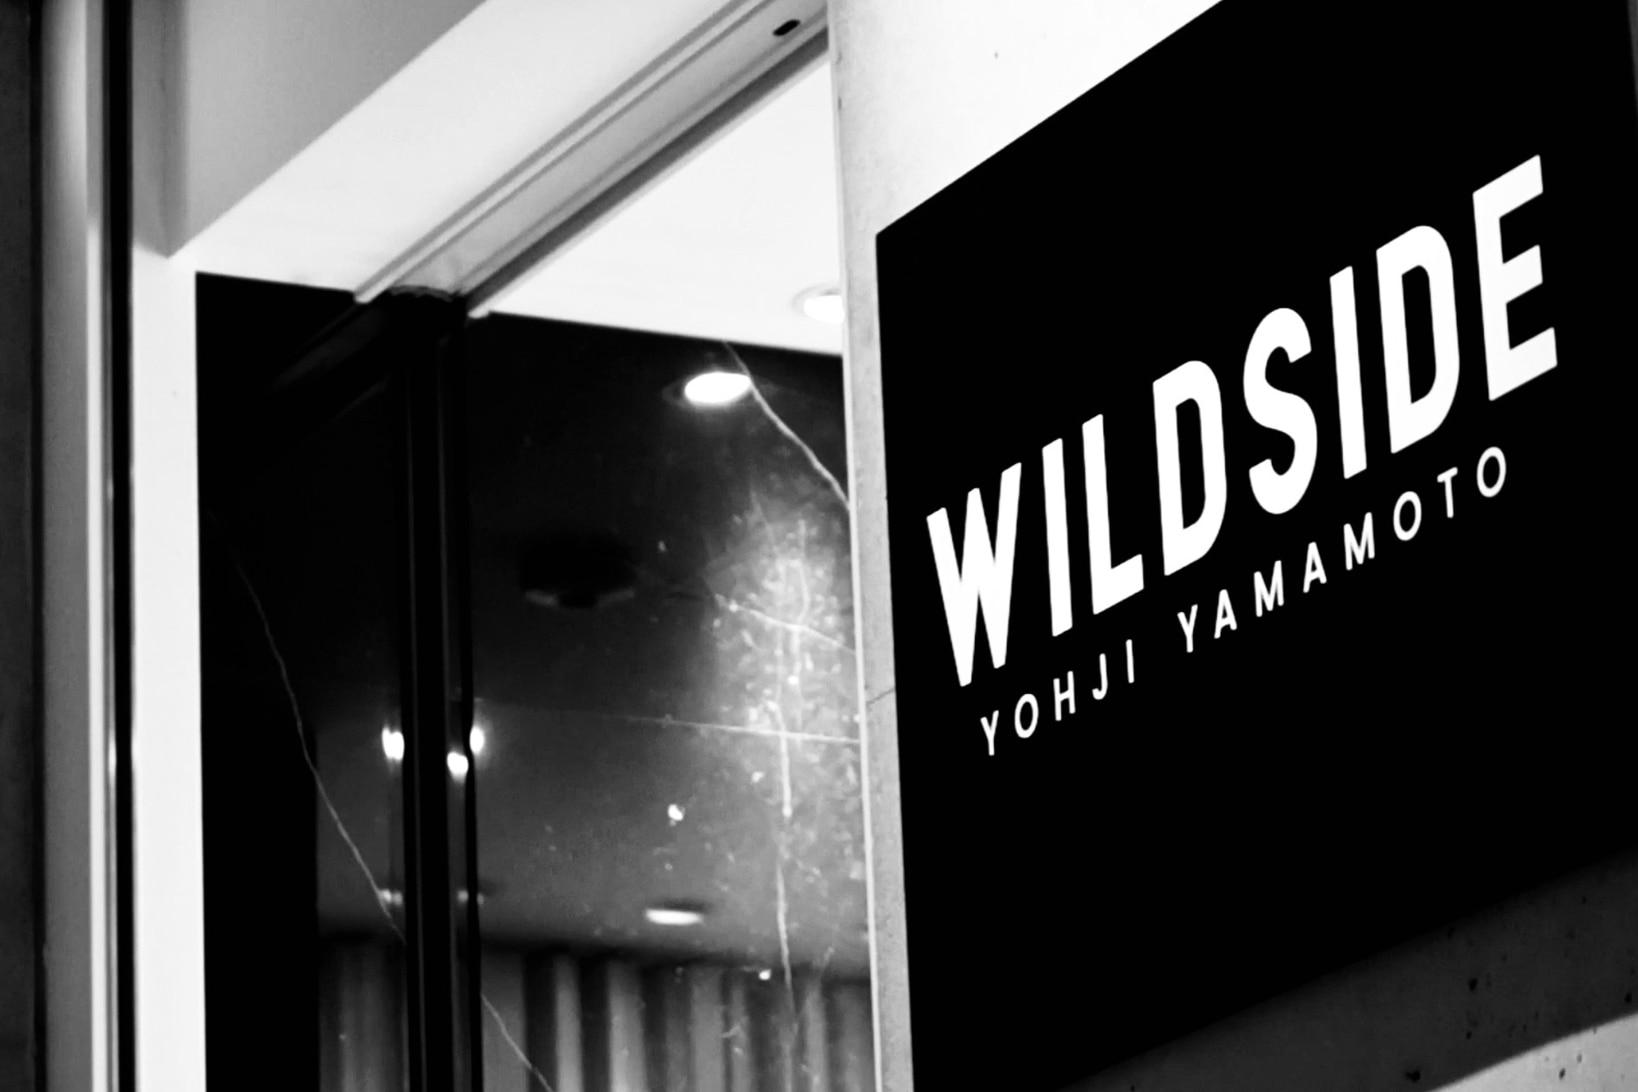 WILDSIDE YOHJI YAMAMOTO 表参道ヒルズ – ストアプレビュー